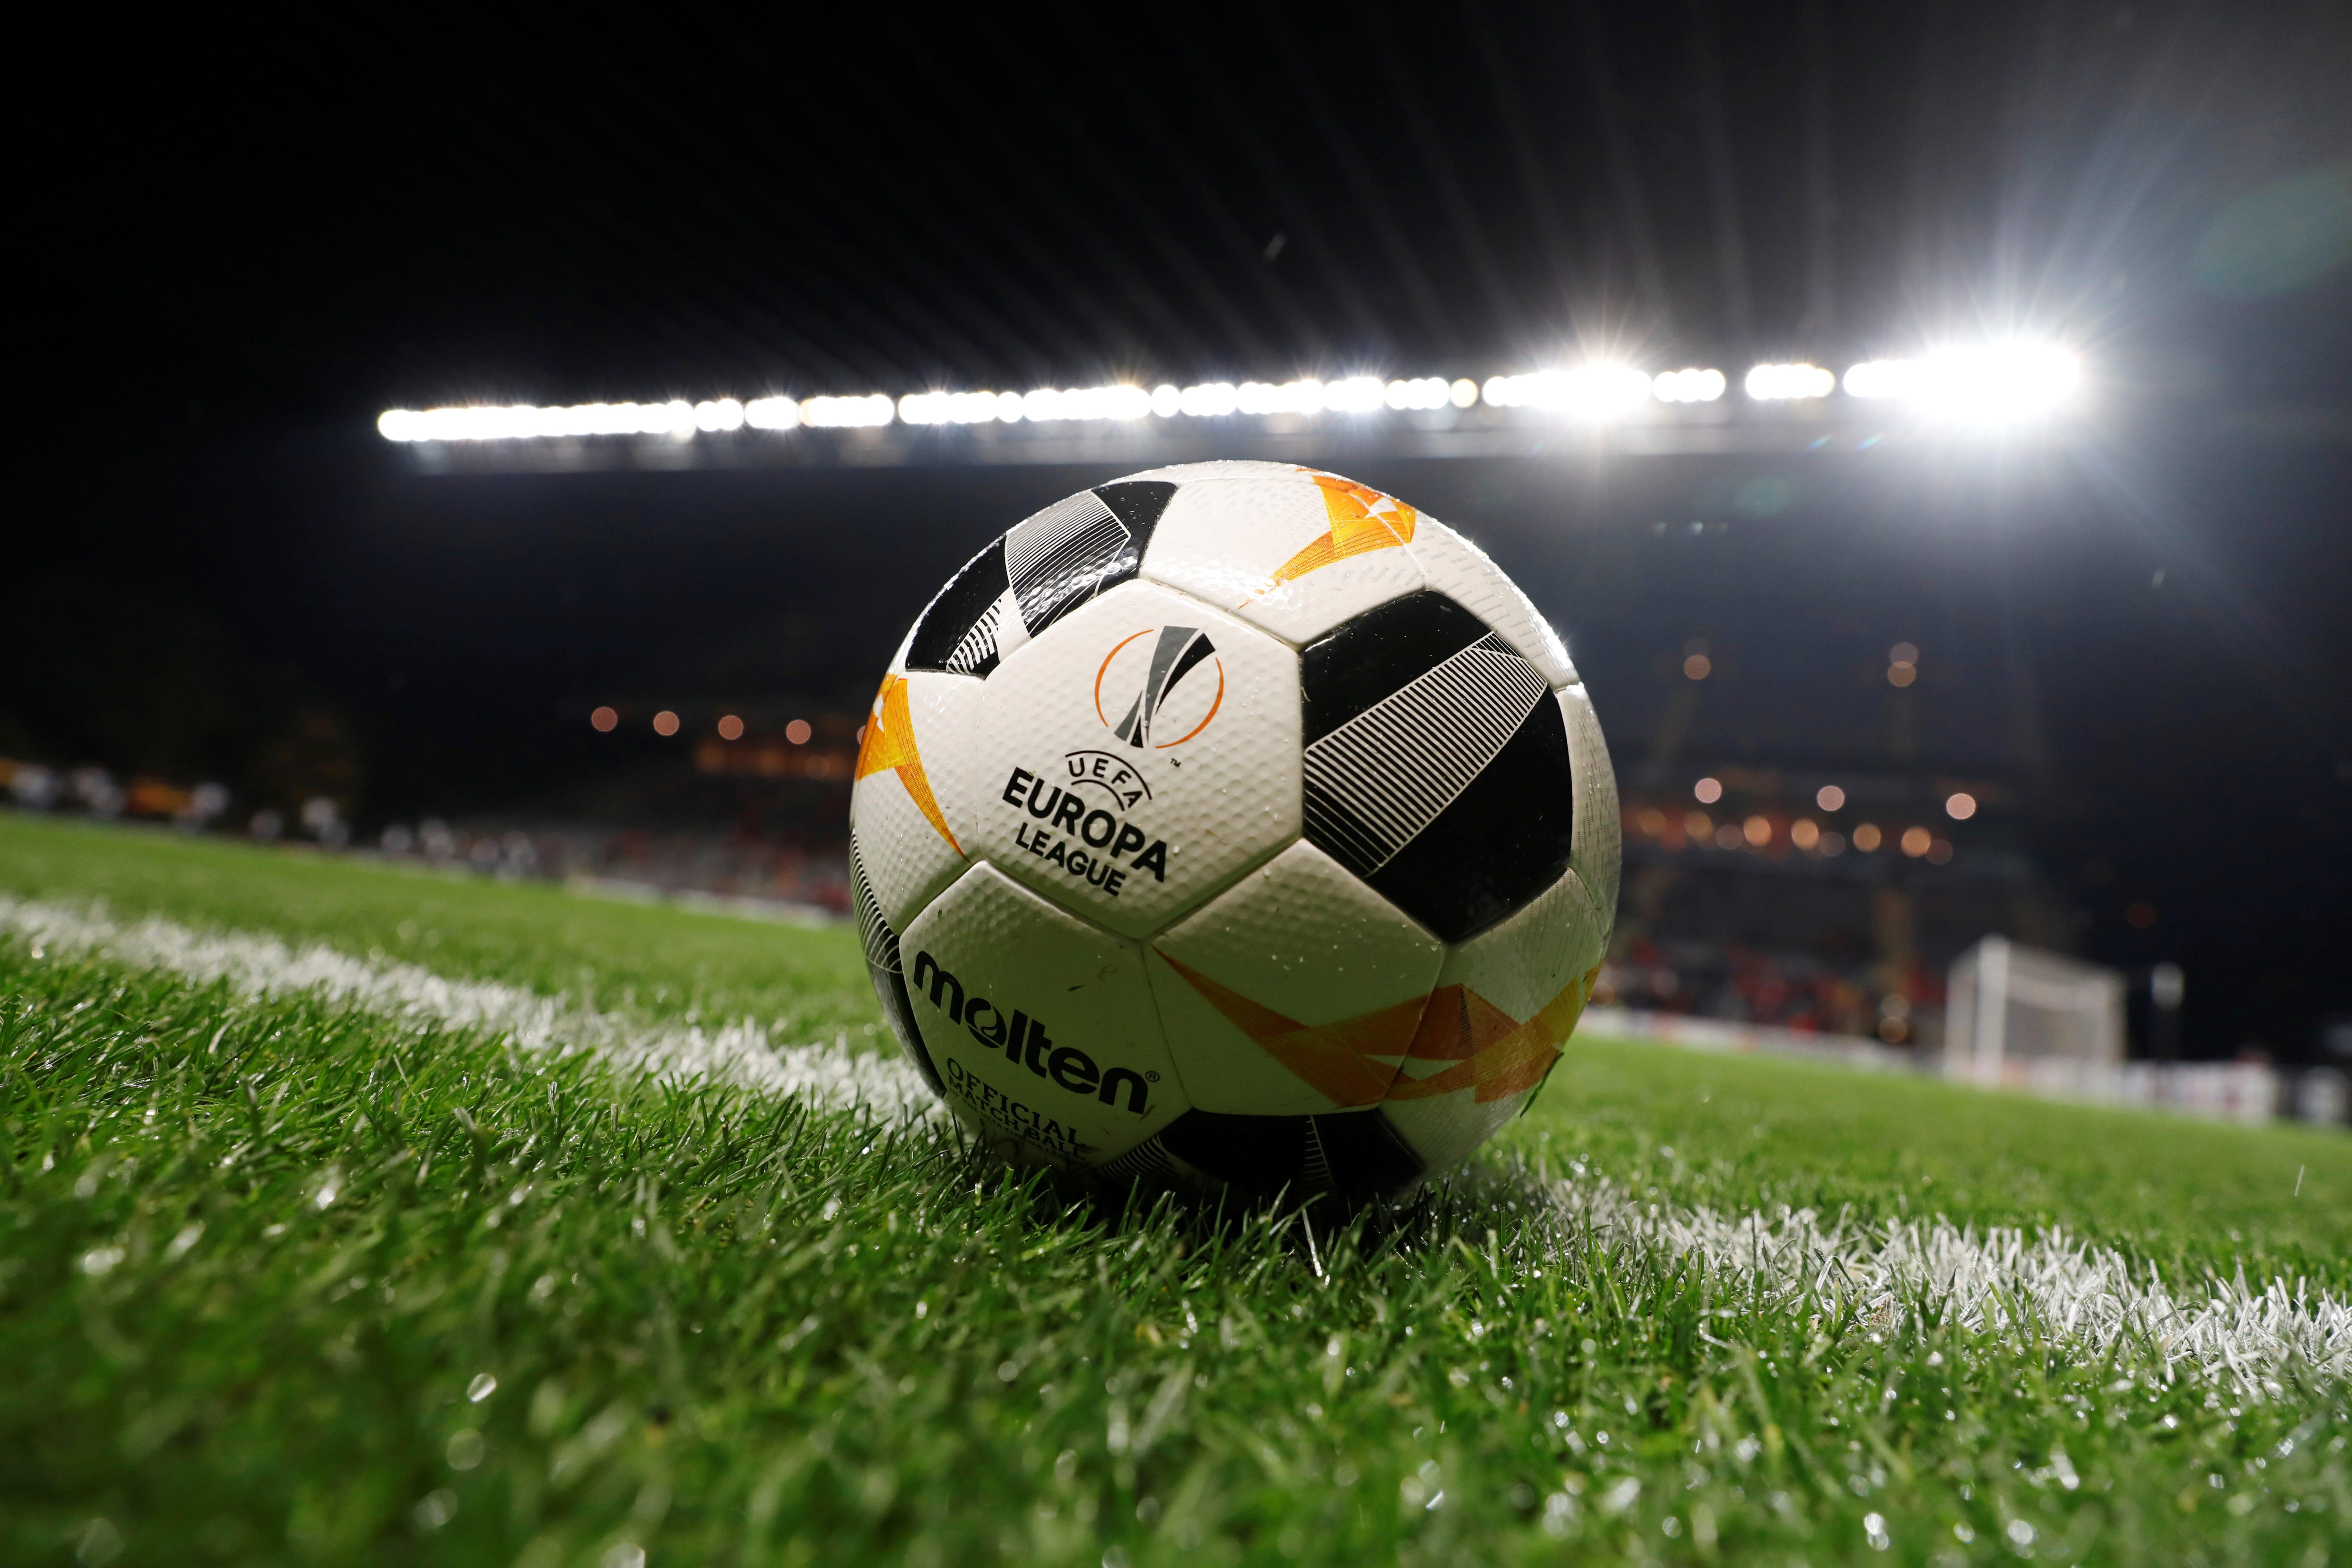 UEFA Europa League Top Goalscorers of All Time